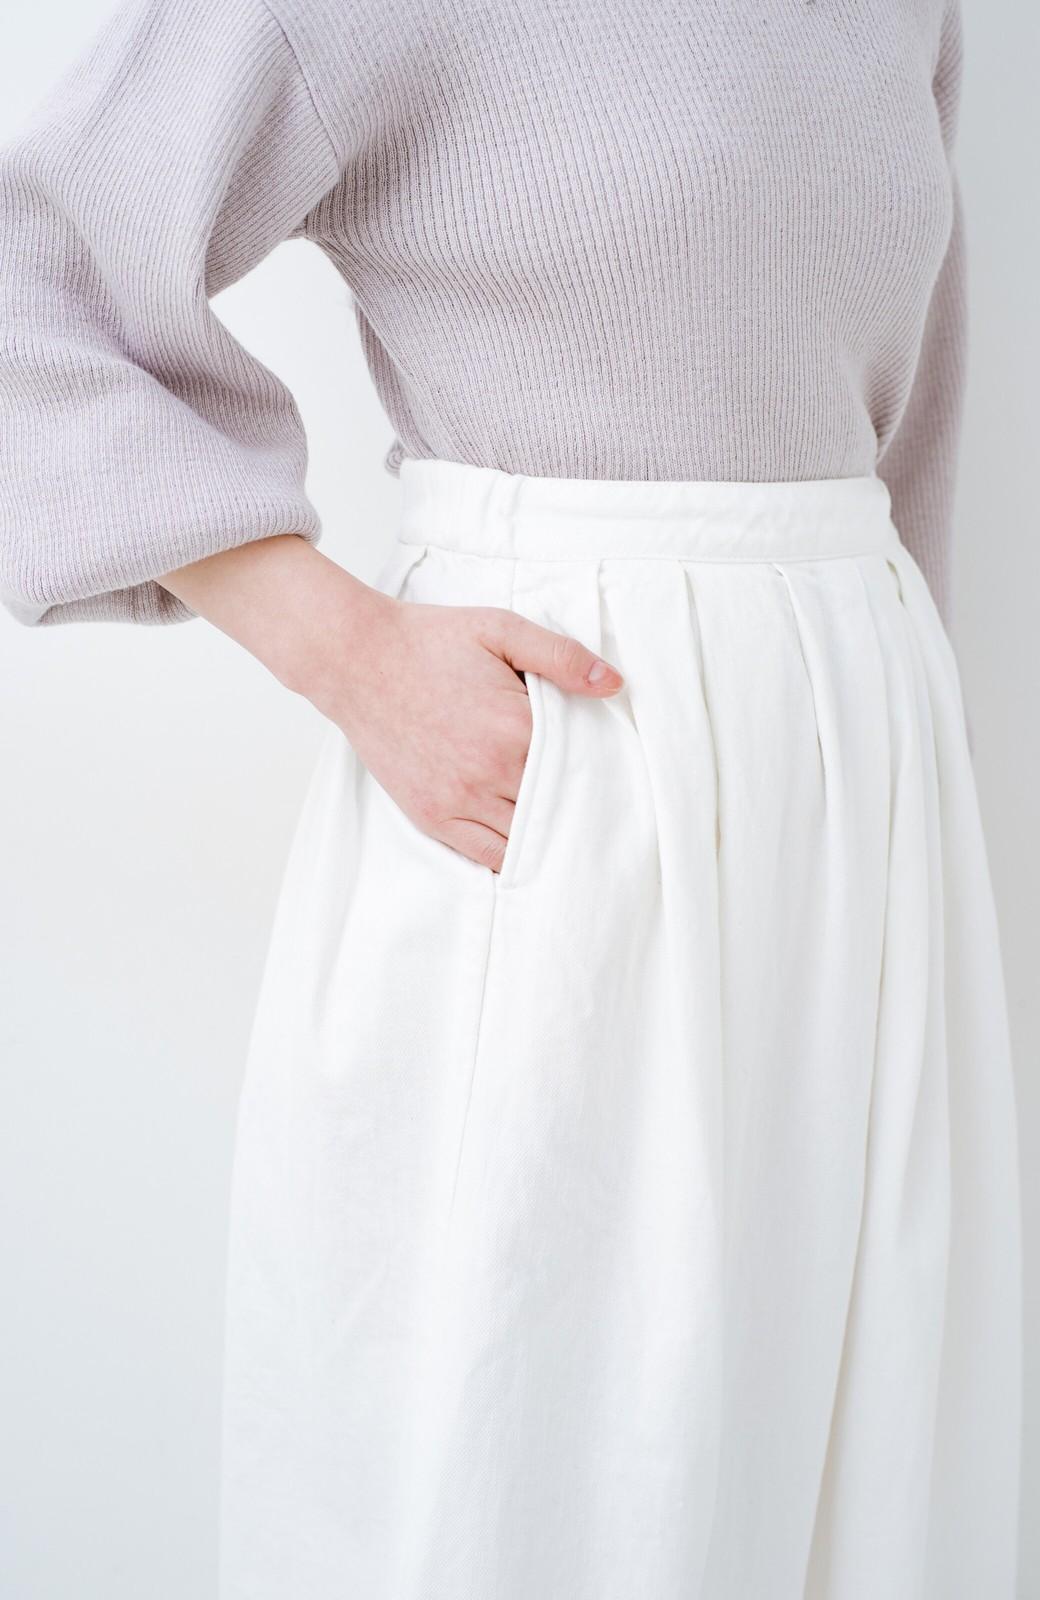 haco! Urvin 伊藤信子×sayurinishikuboコラボ tann'sスカート <ホワイト>の商品写真7